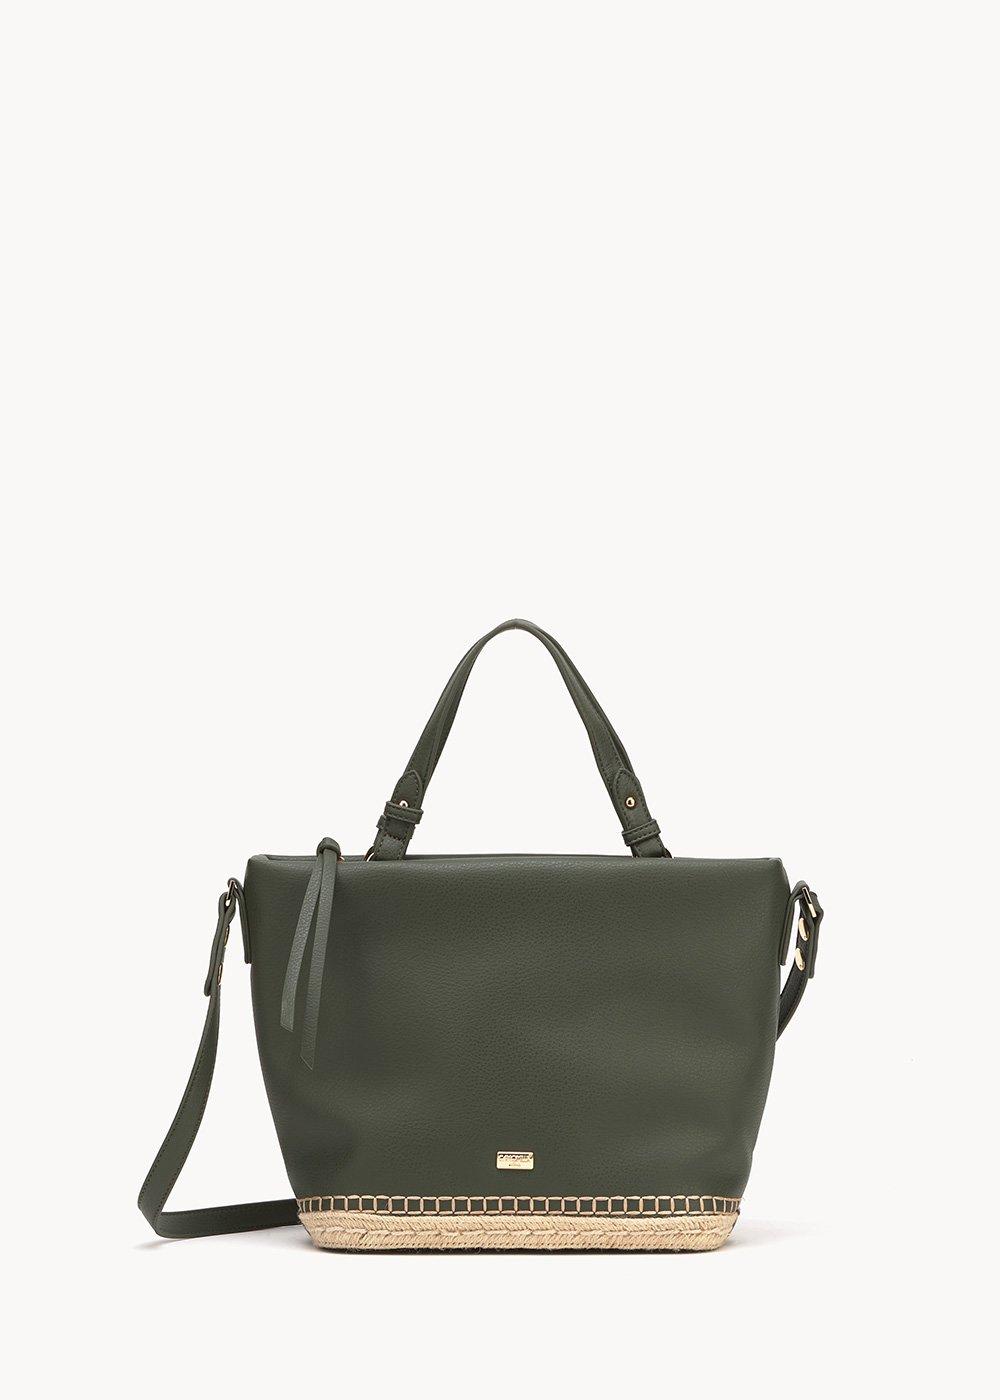 Beltran shopping bag with woven bottom